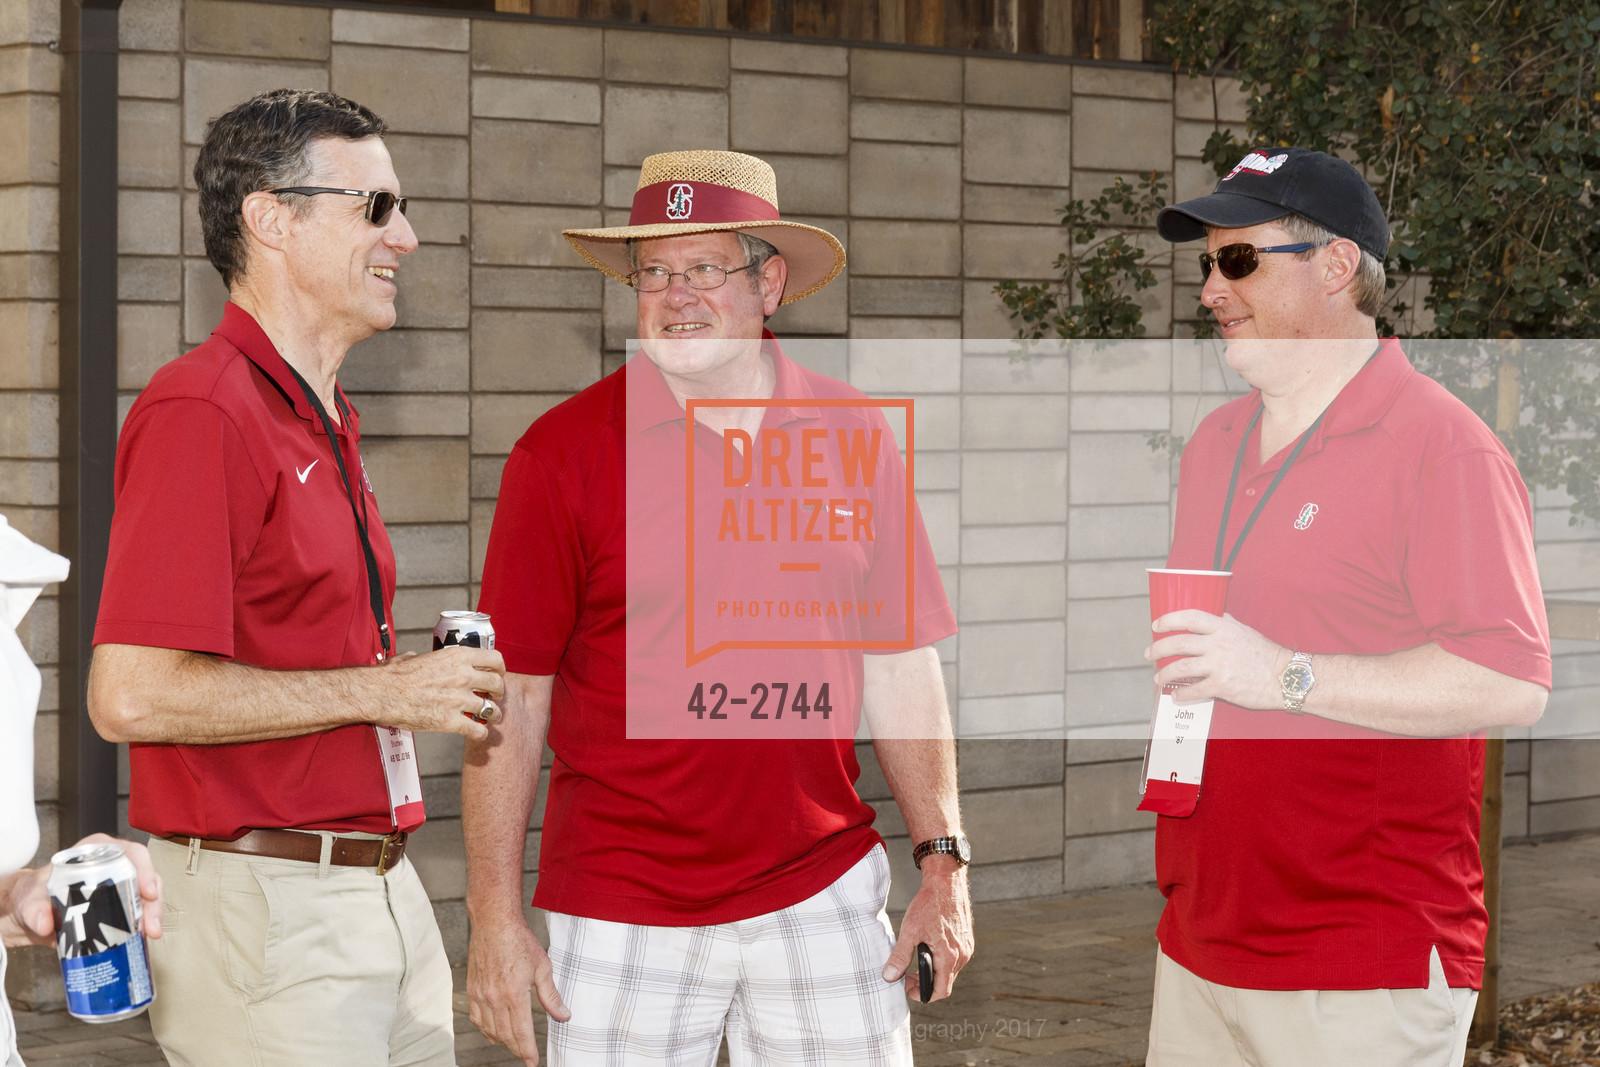 Garry Shemway, Ron O'Rourke, John Moore, Photo #42-2744